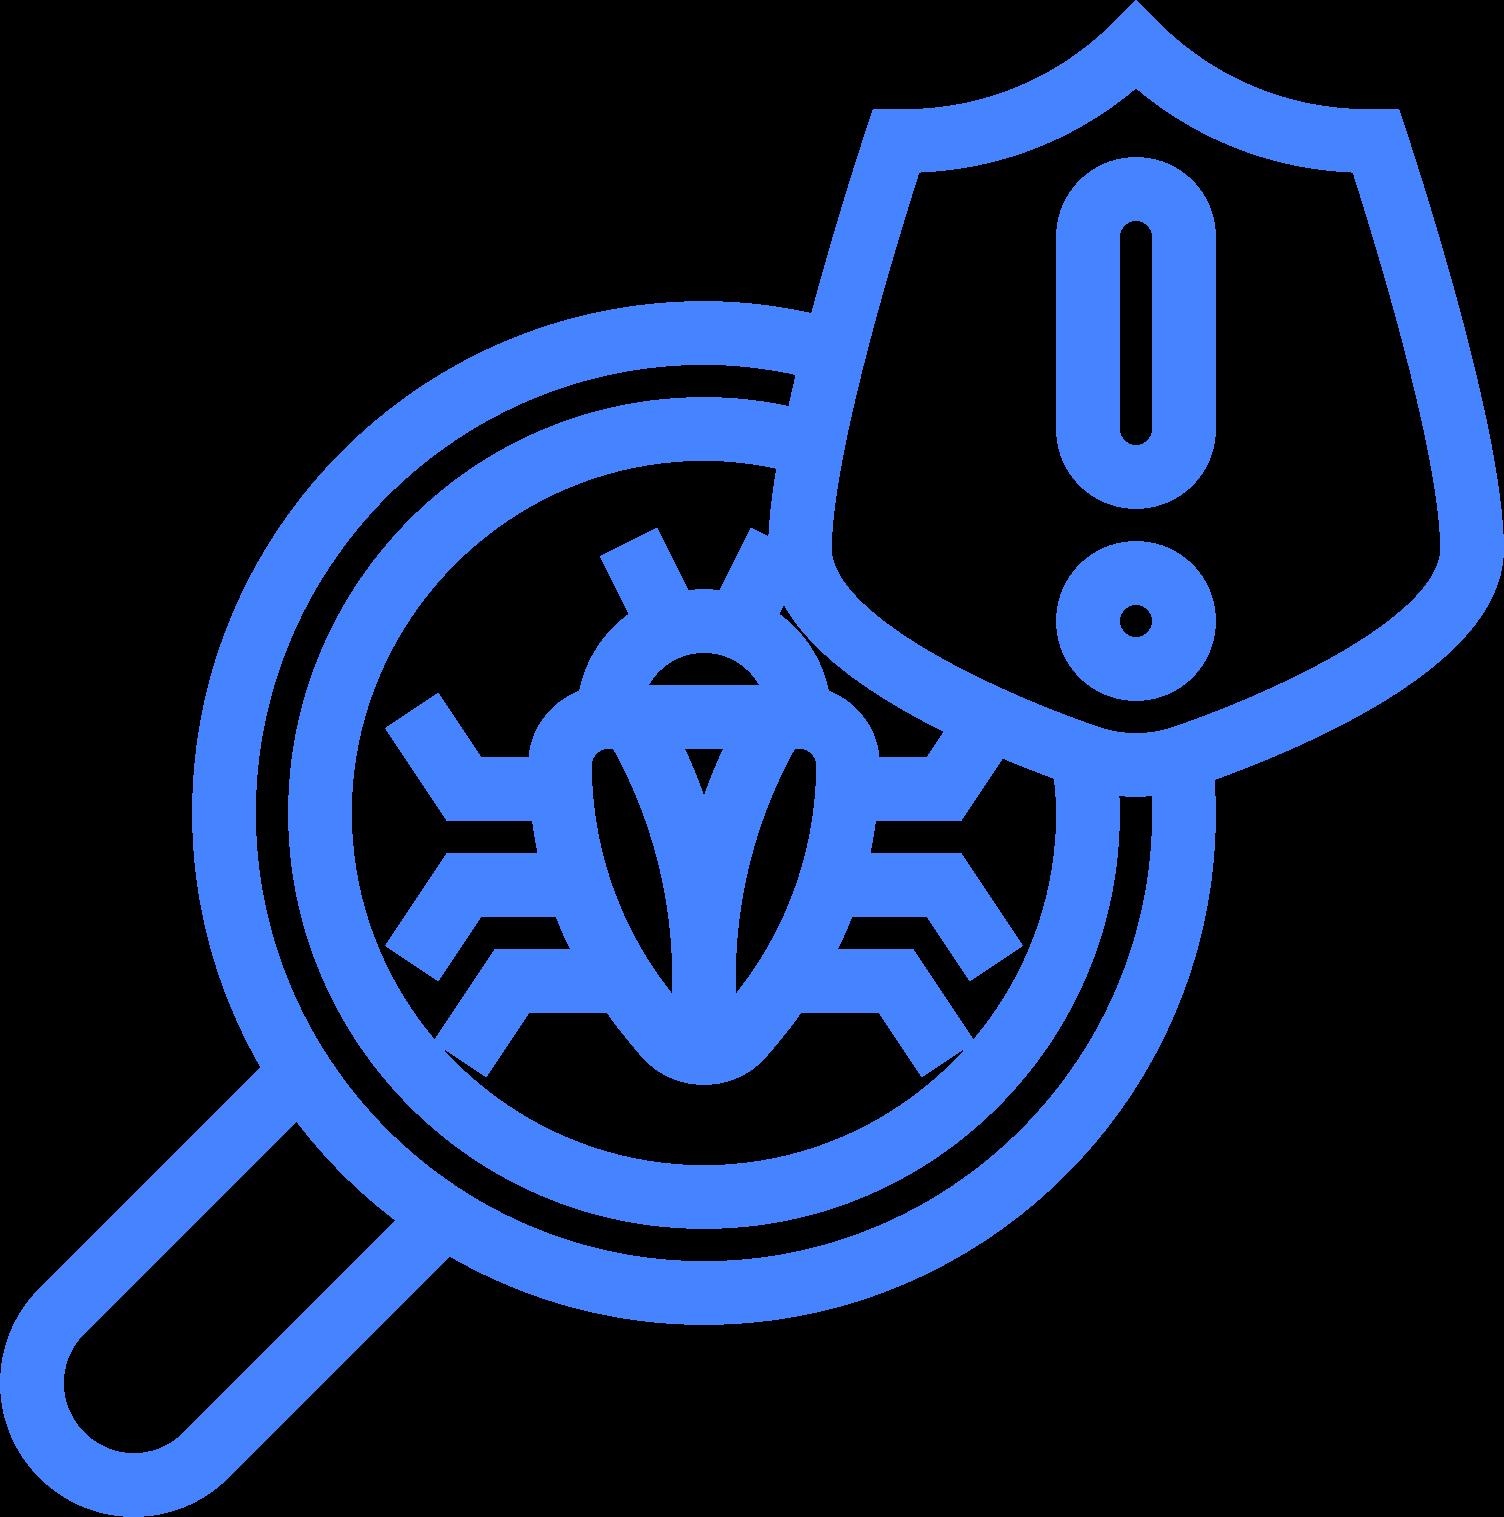 Vr-Ar_Error_Resolve_Icon